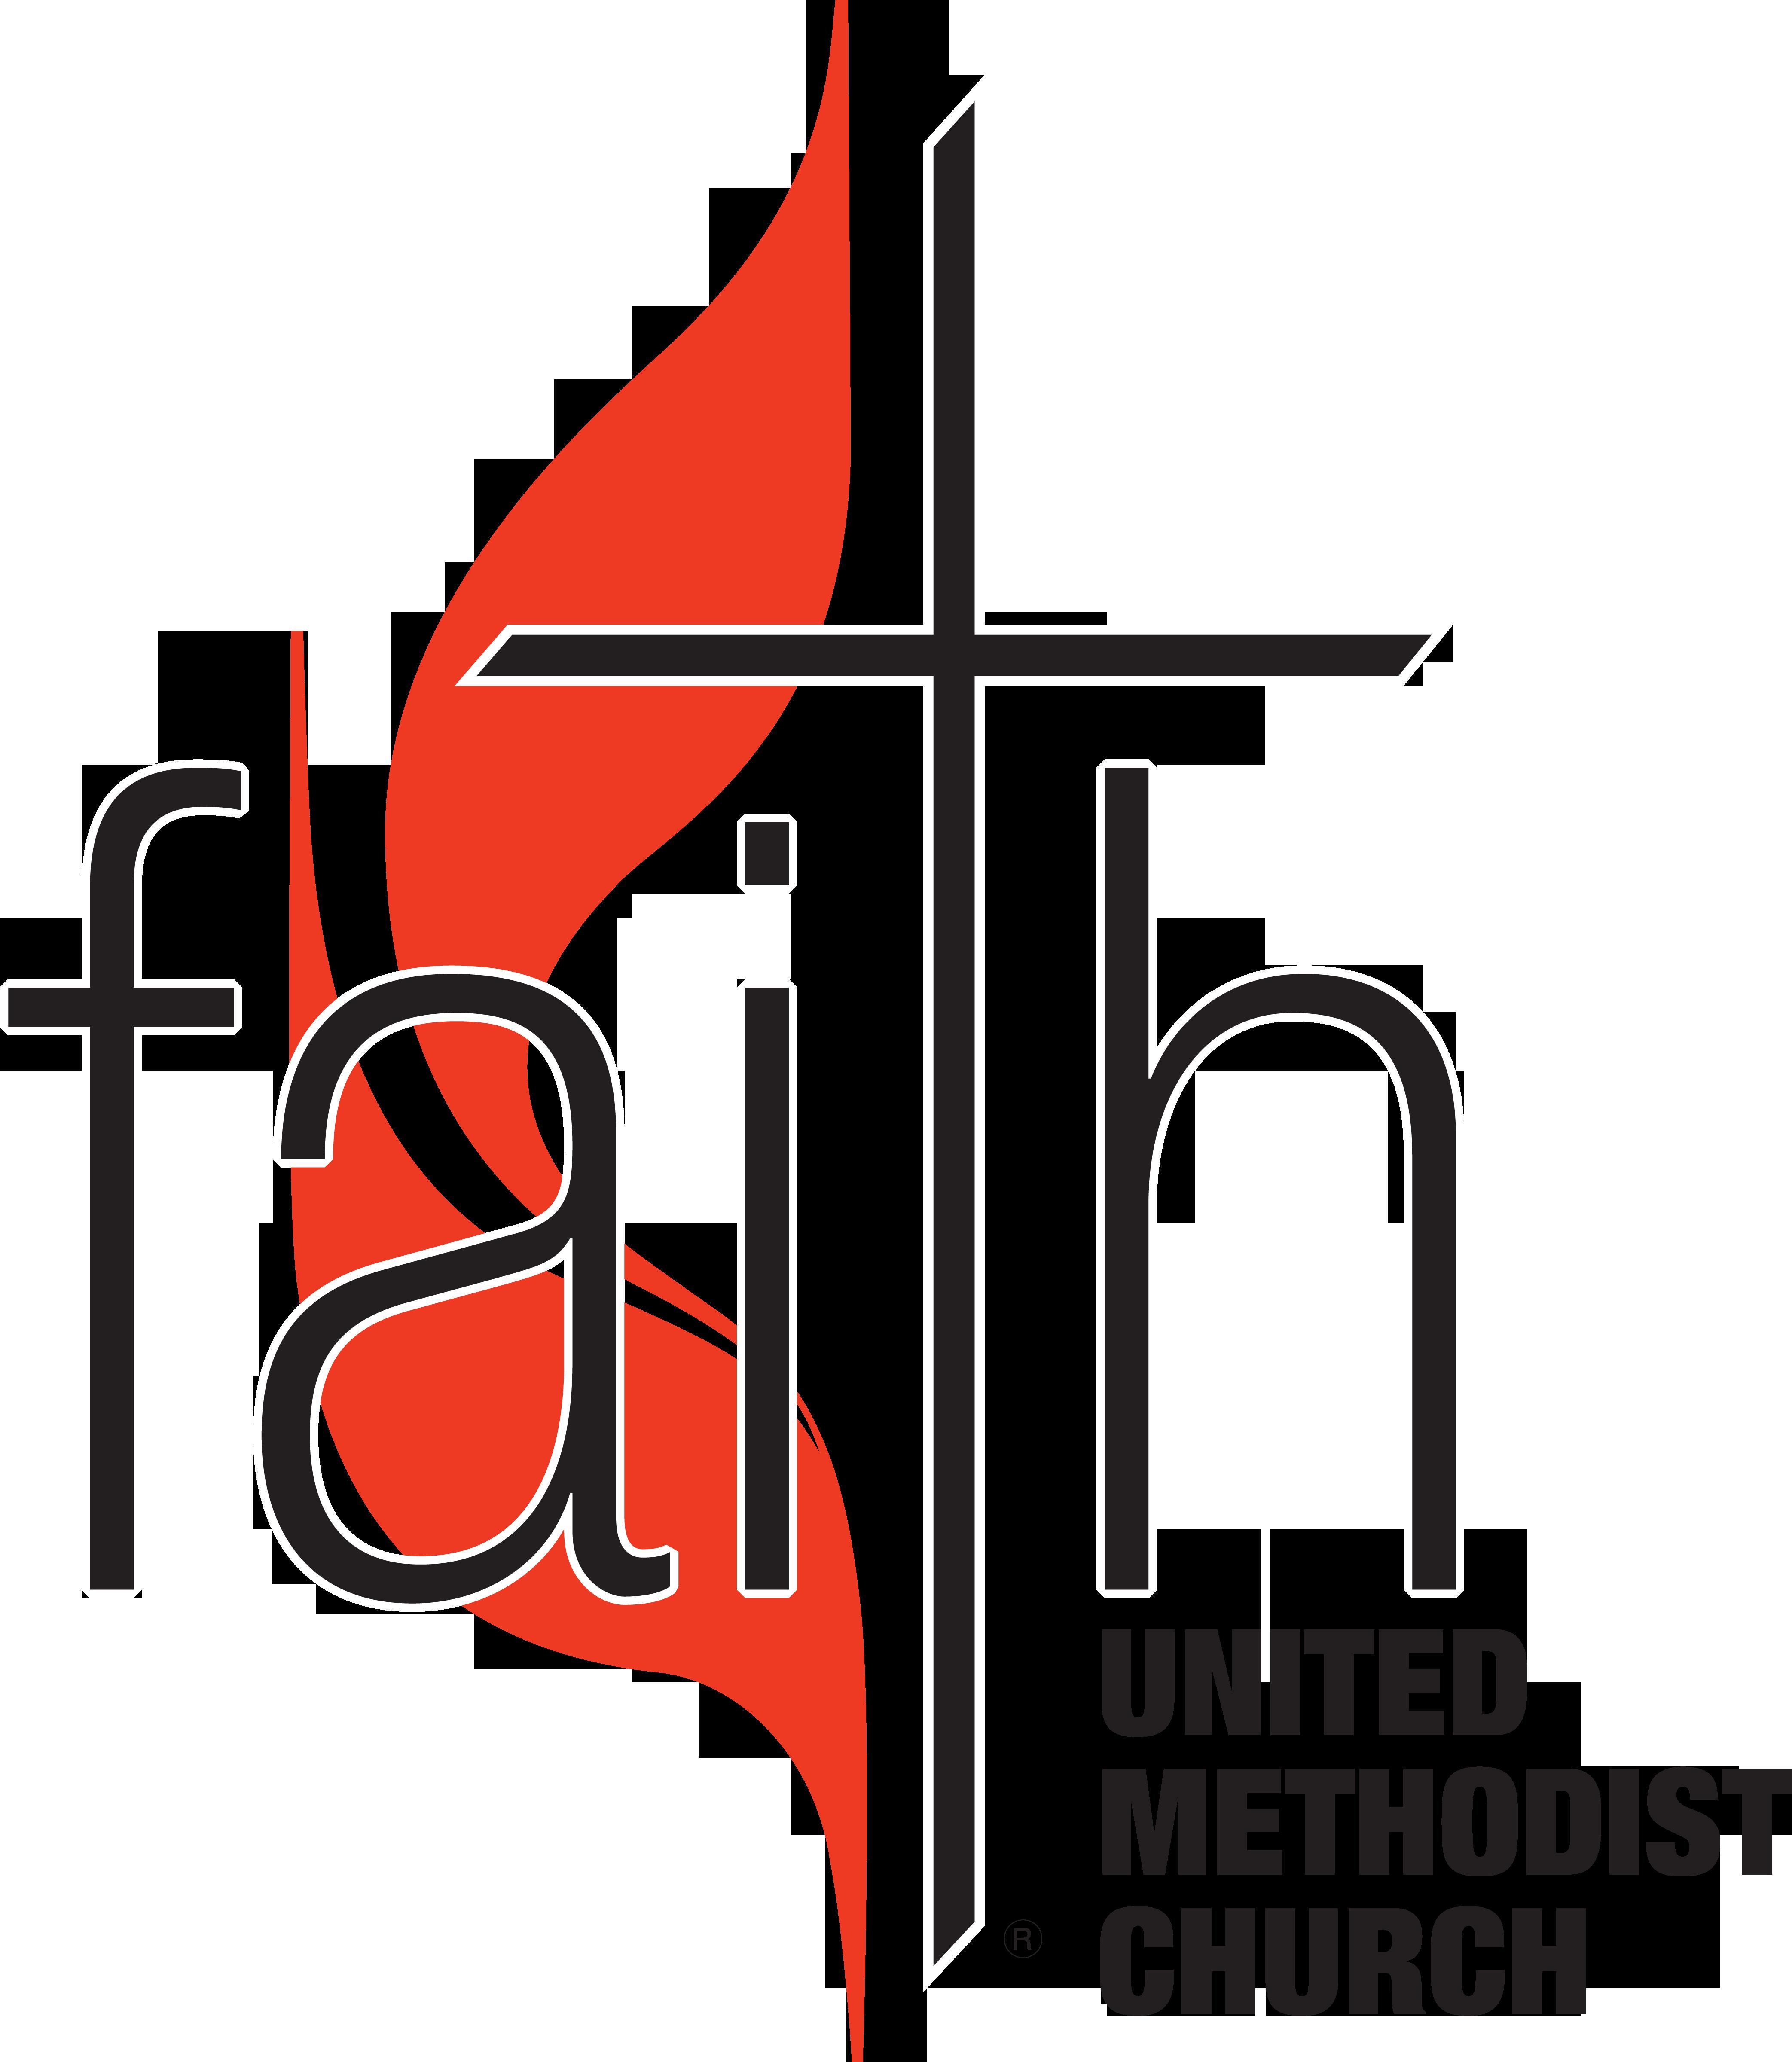 United methodist church Logos clipart stock